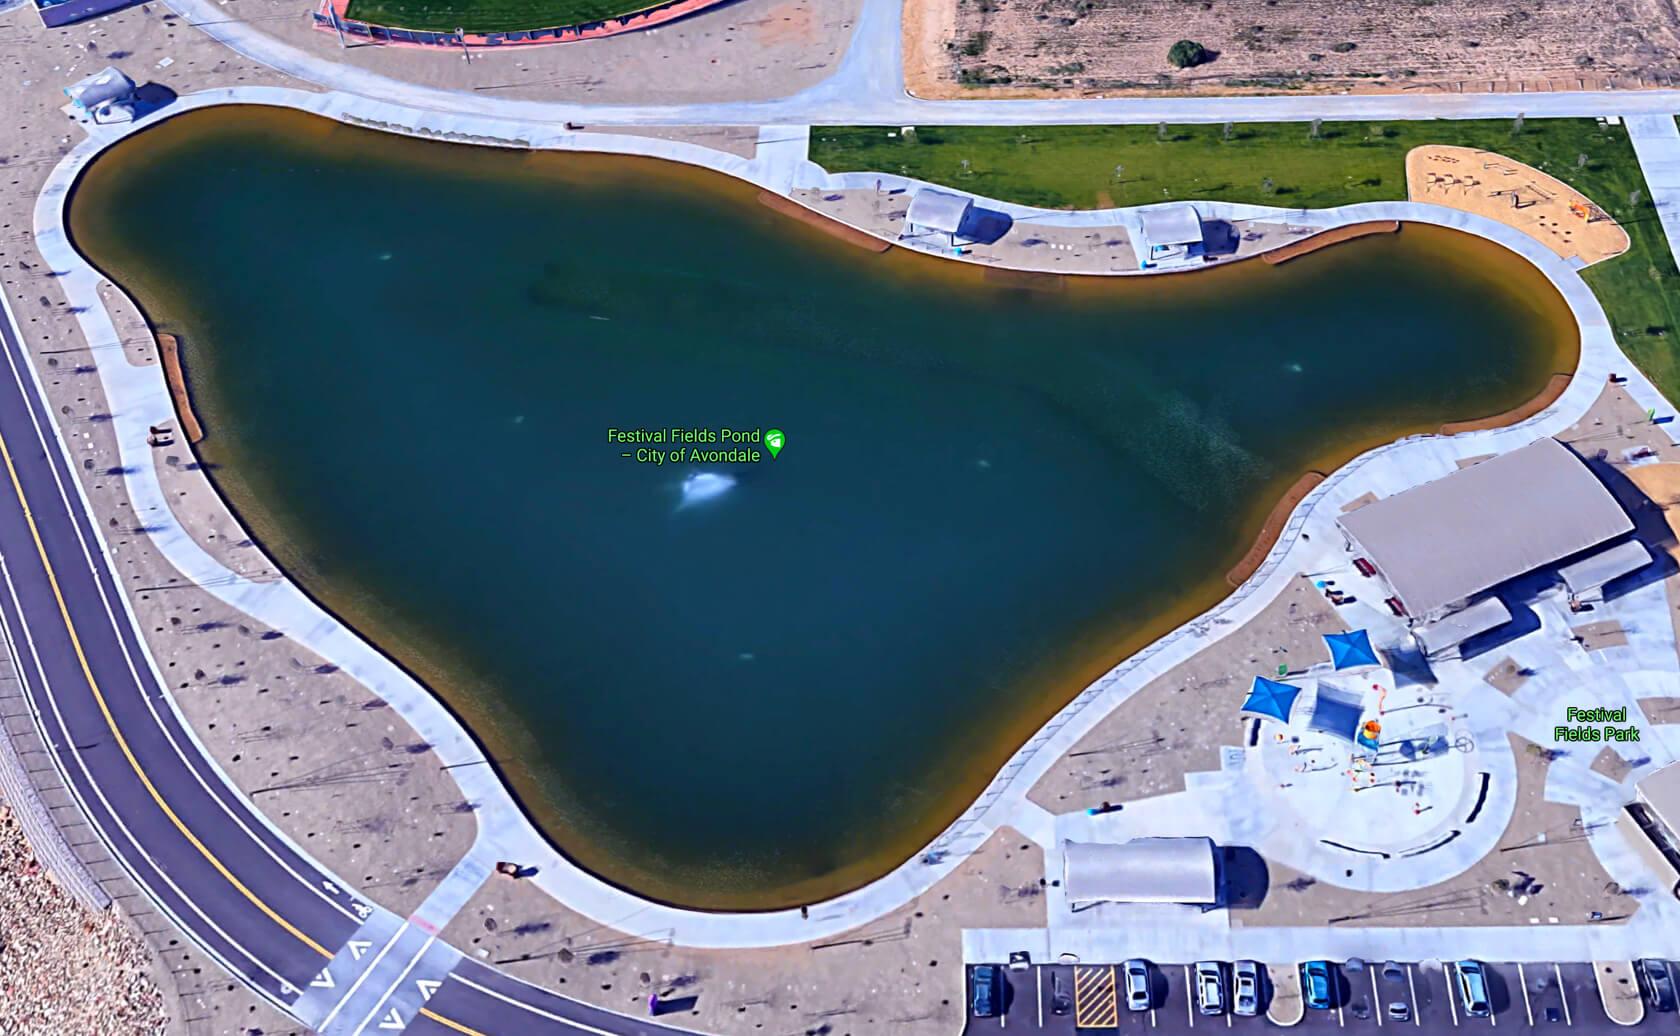 Festival-Fields-Lake-fishing-guide-report-Avondale-AZ-01